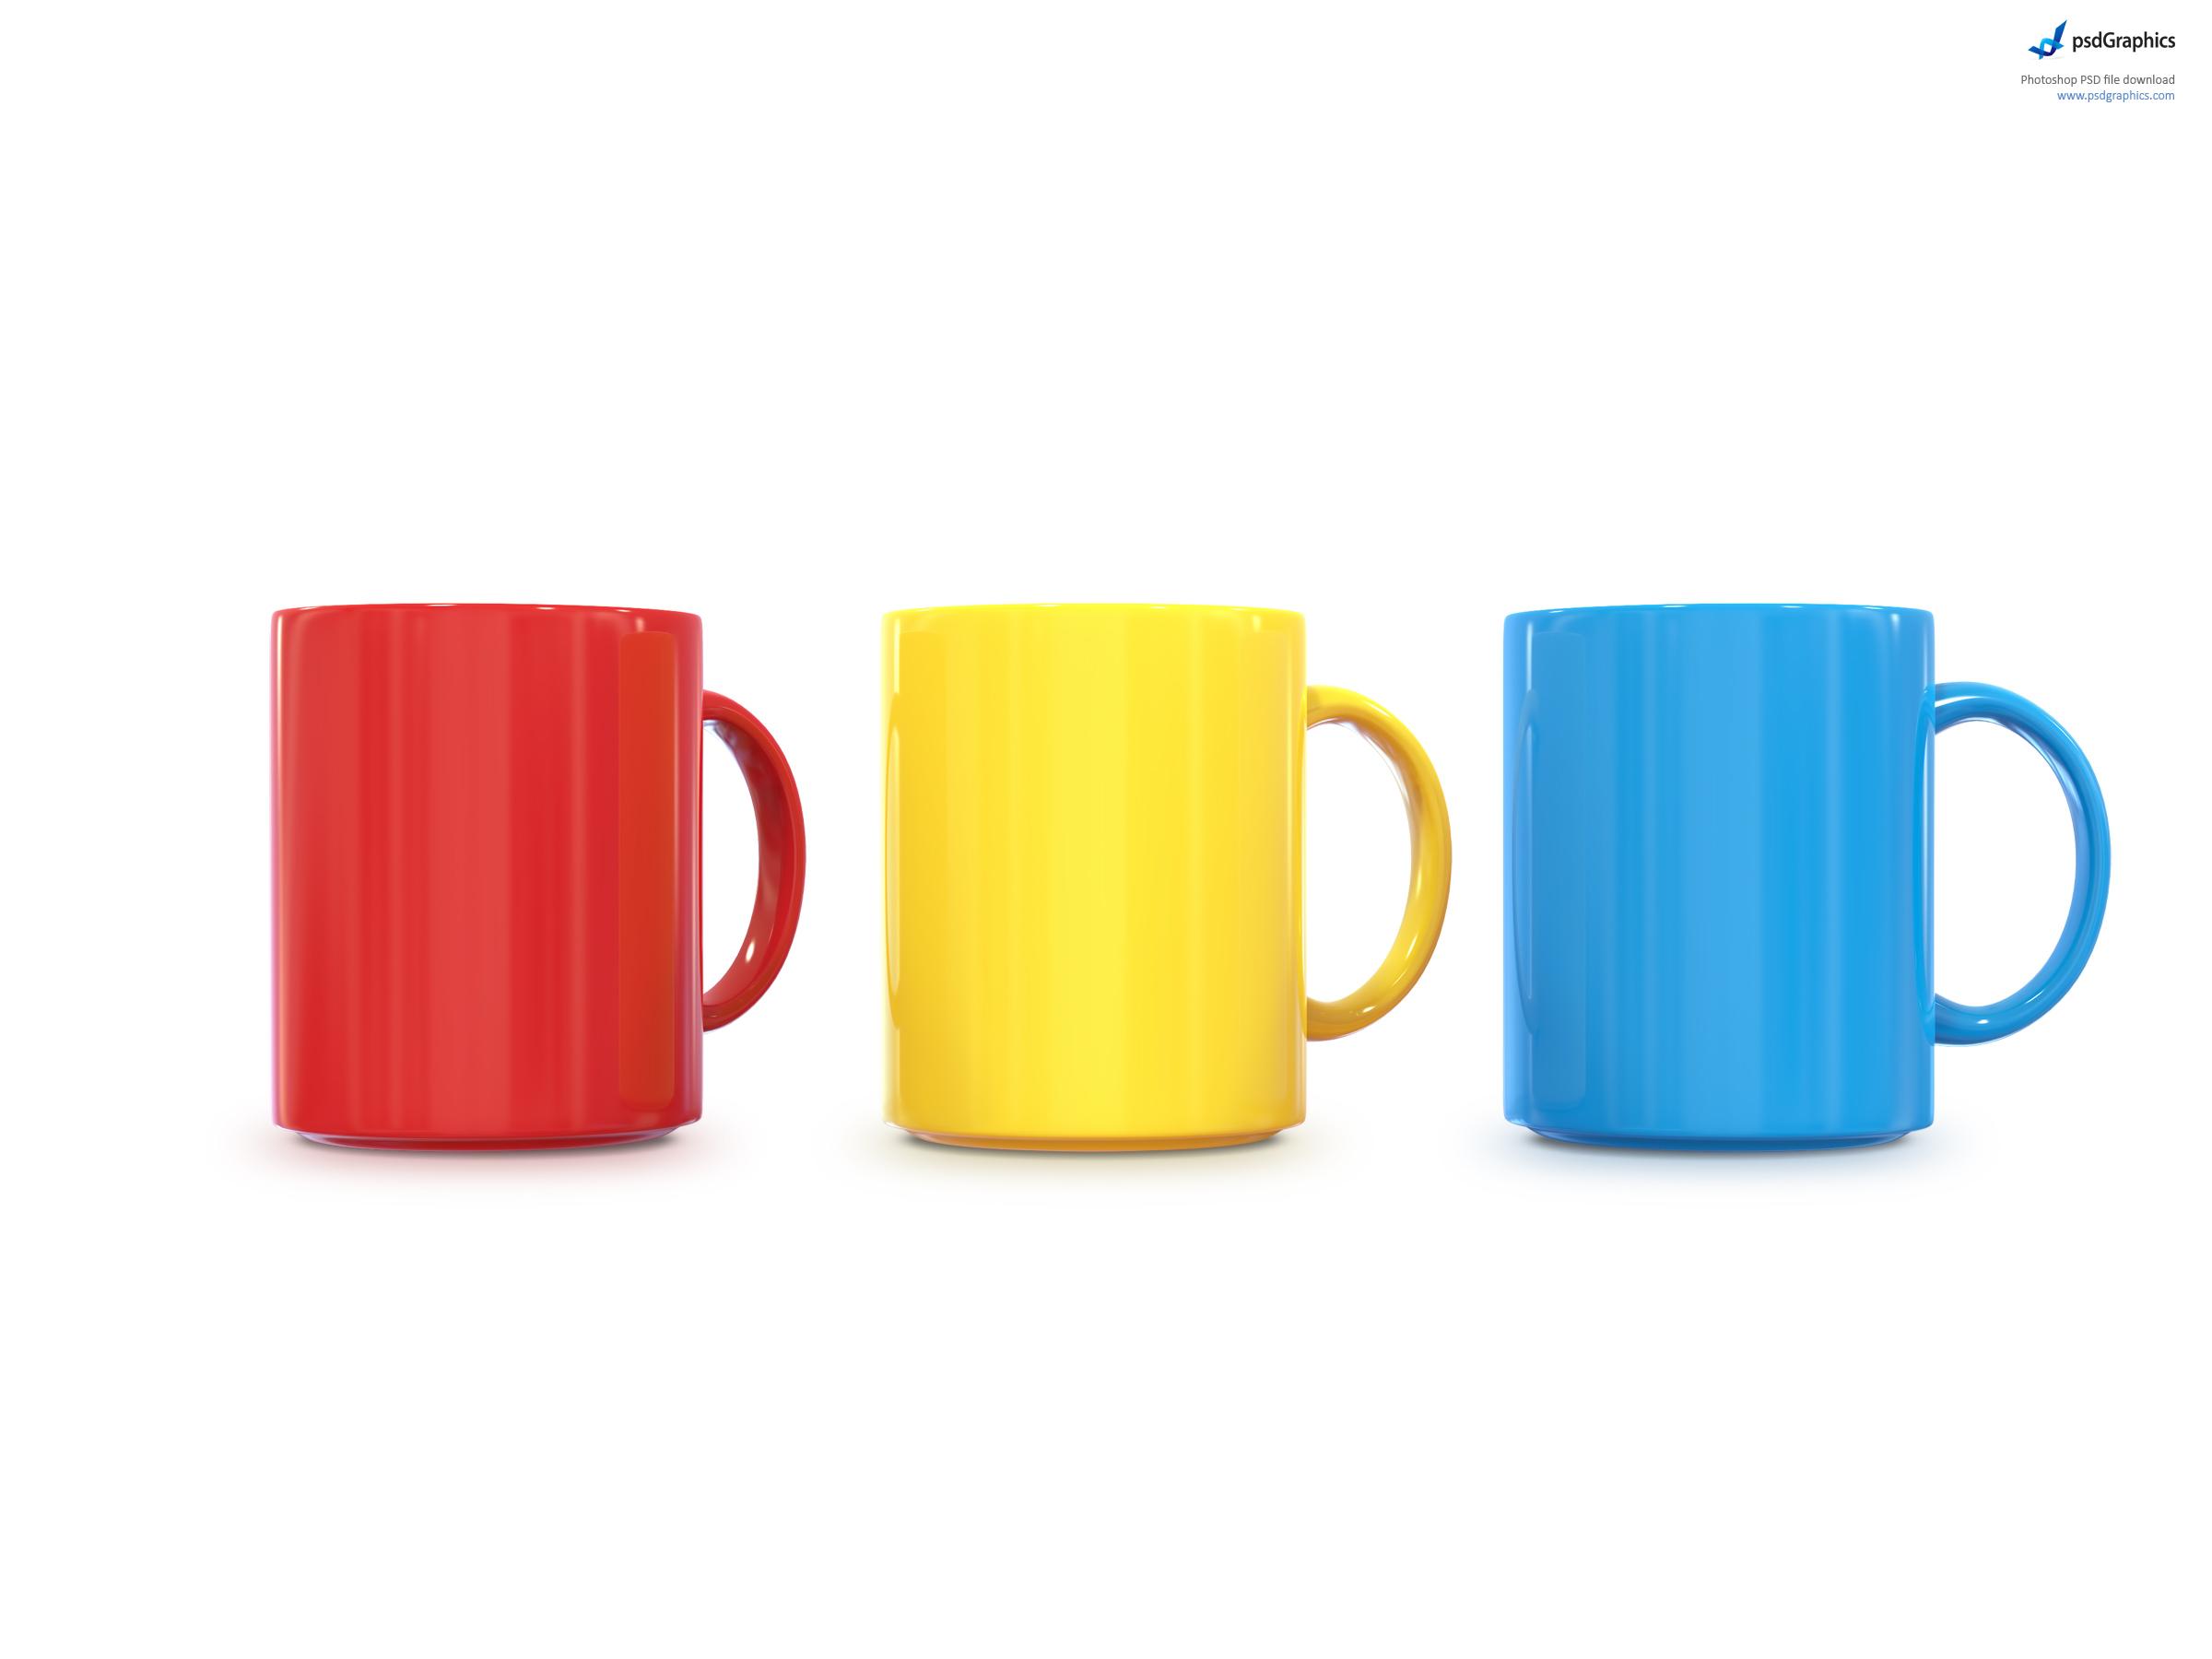 blank mugs psd template psdgraphics blank mugs psd template psdgraphics